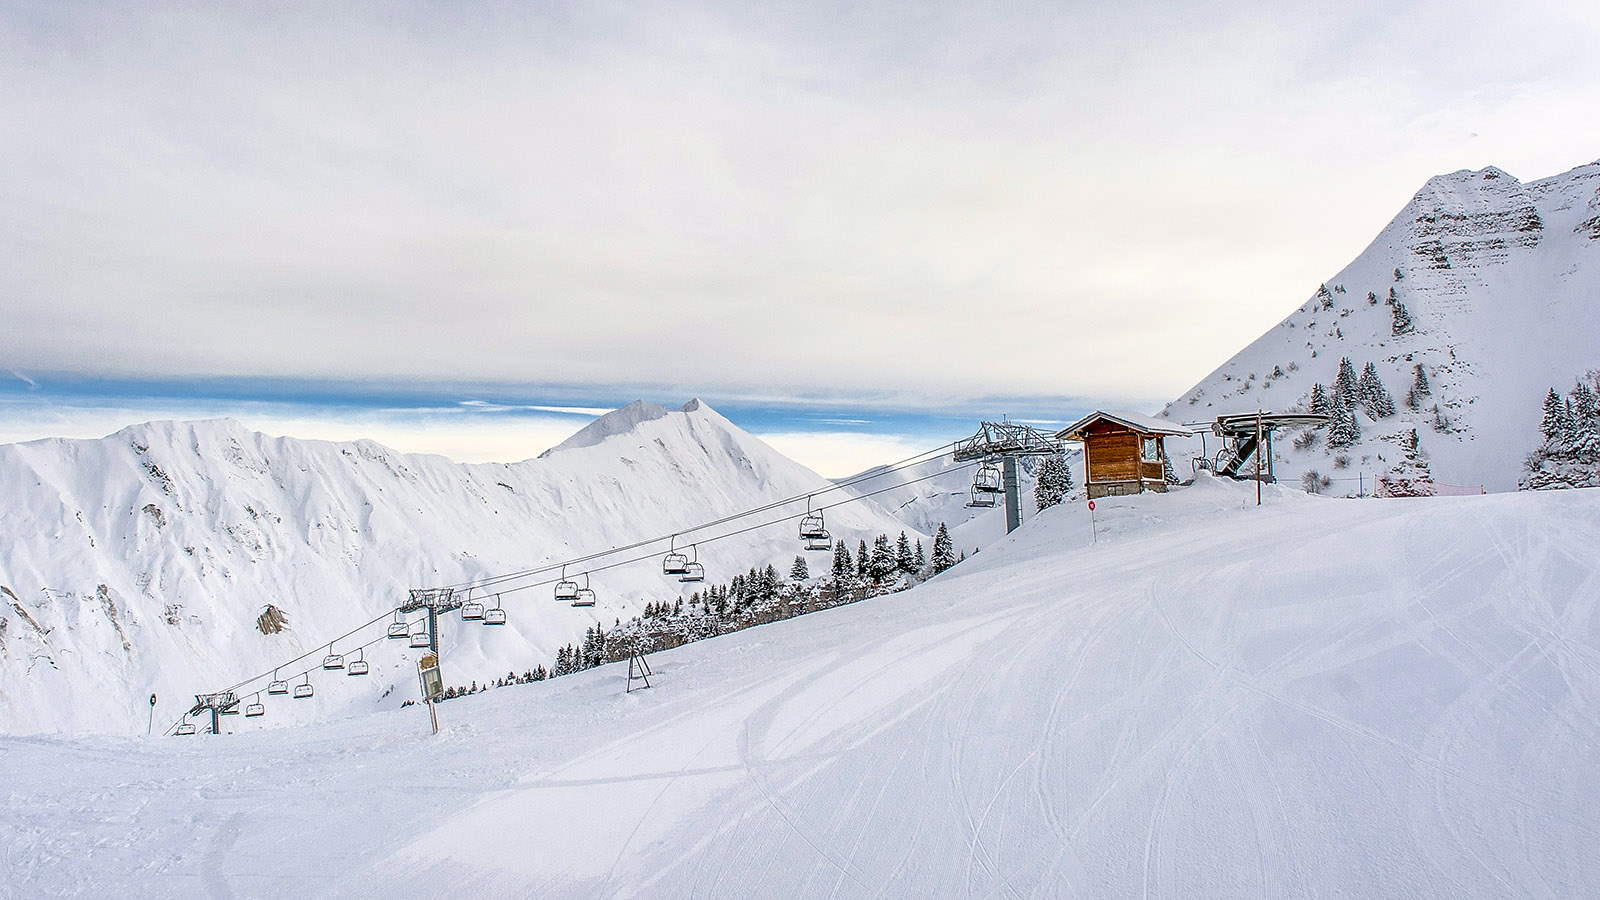 Le Grand Bornand, Blick ins Tal. Foto: Hilke Maunder